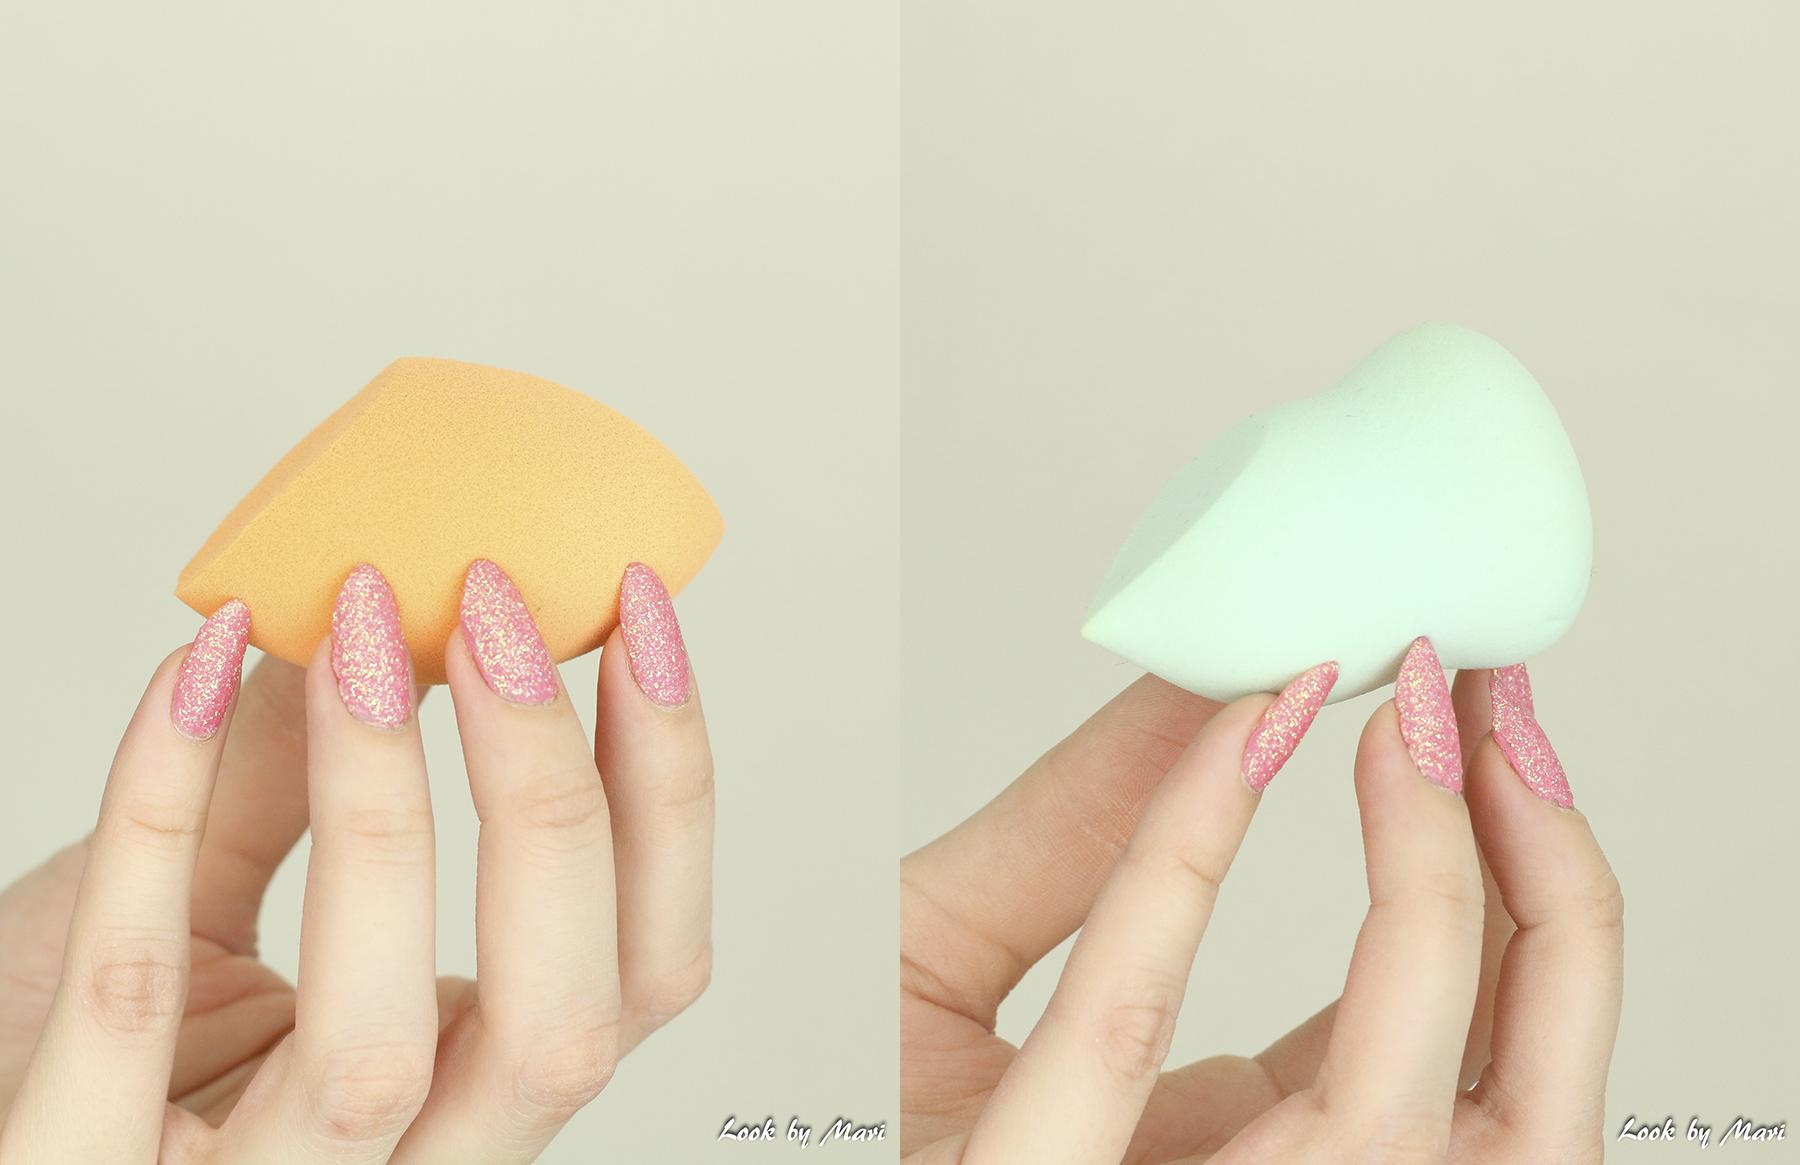 14 real techniques vs nanshy beauty sponge review kokemuksia pastelbeauty.fi